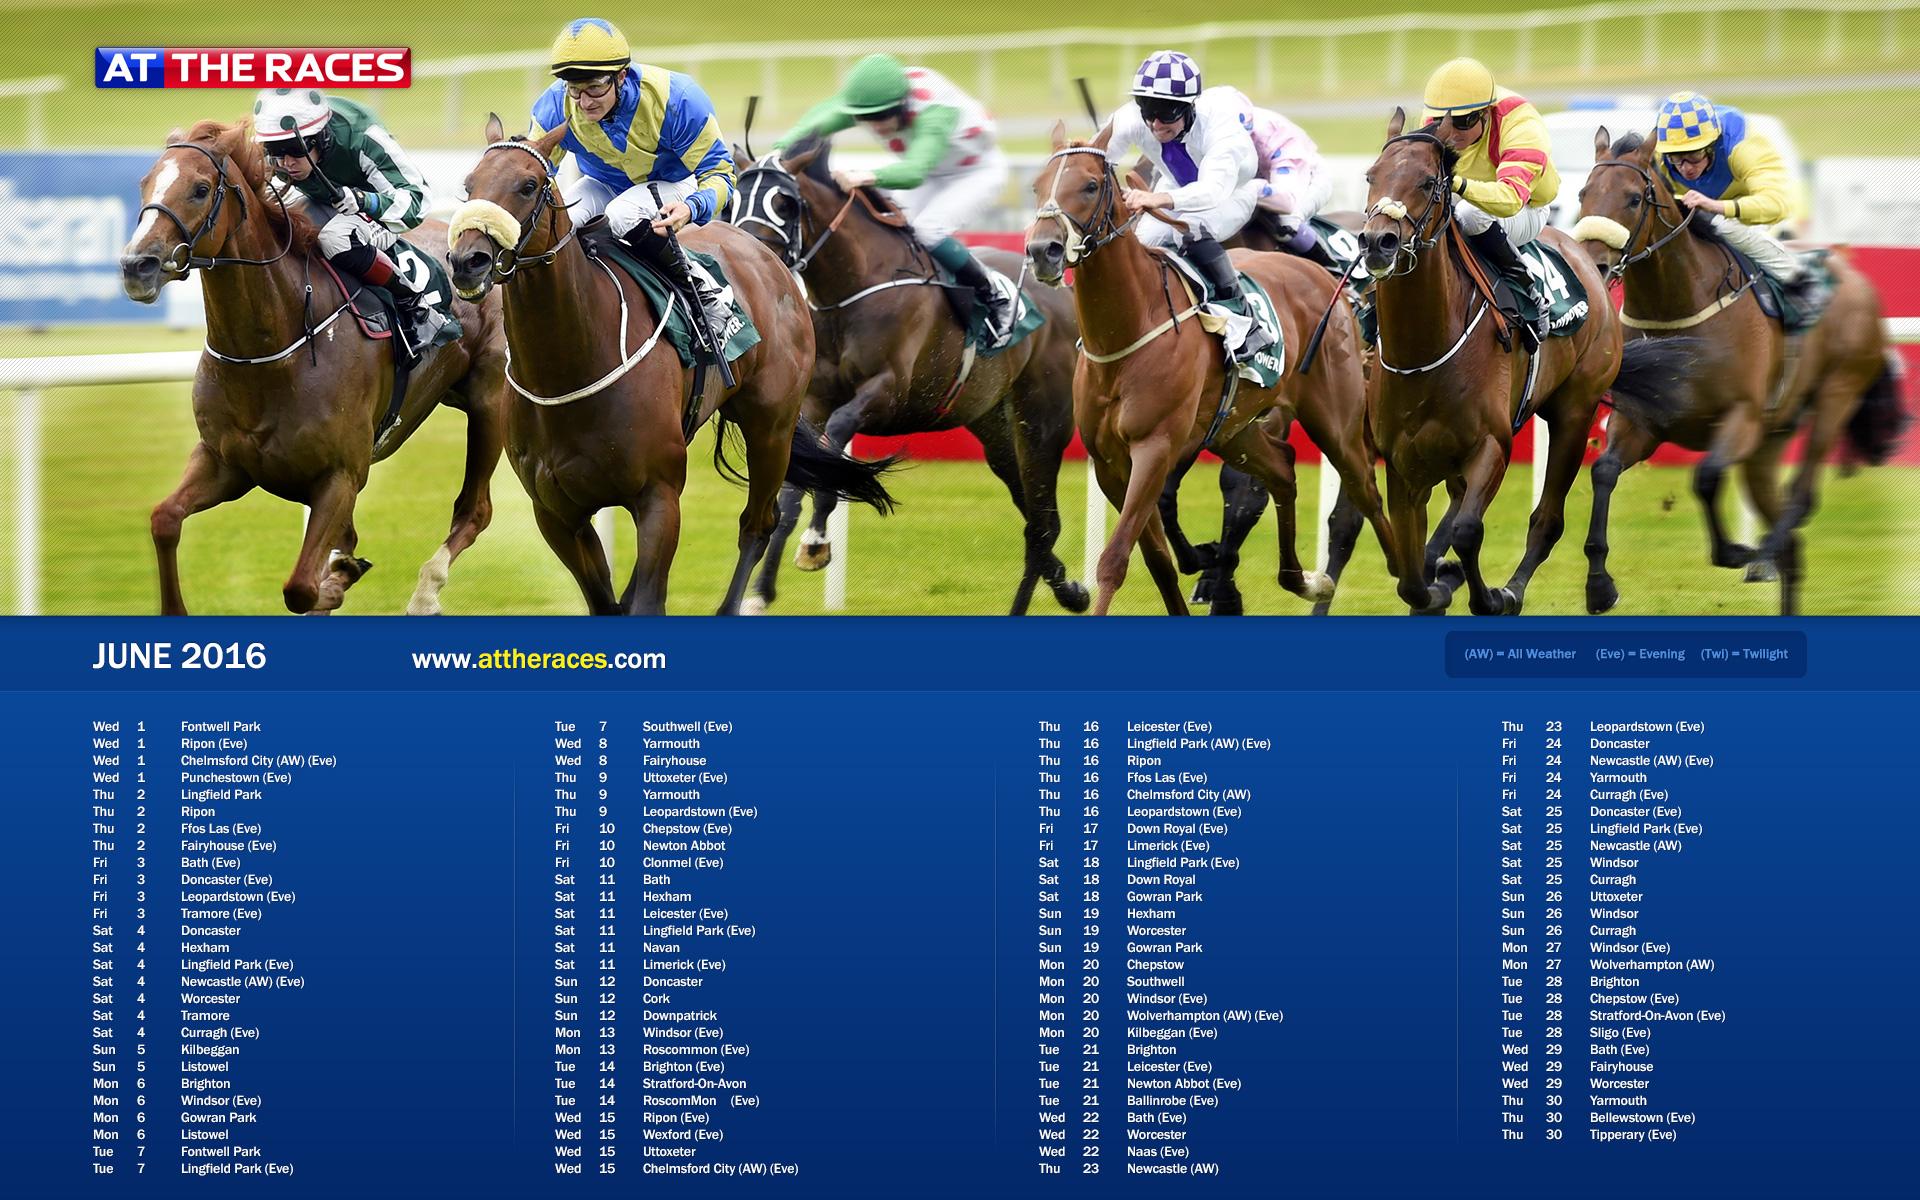 Racing Calendar June : At the races calendar